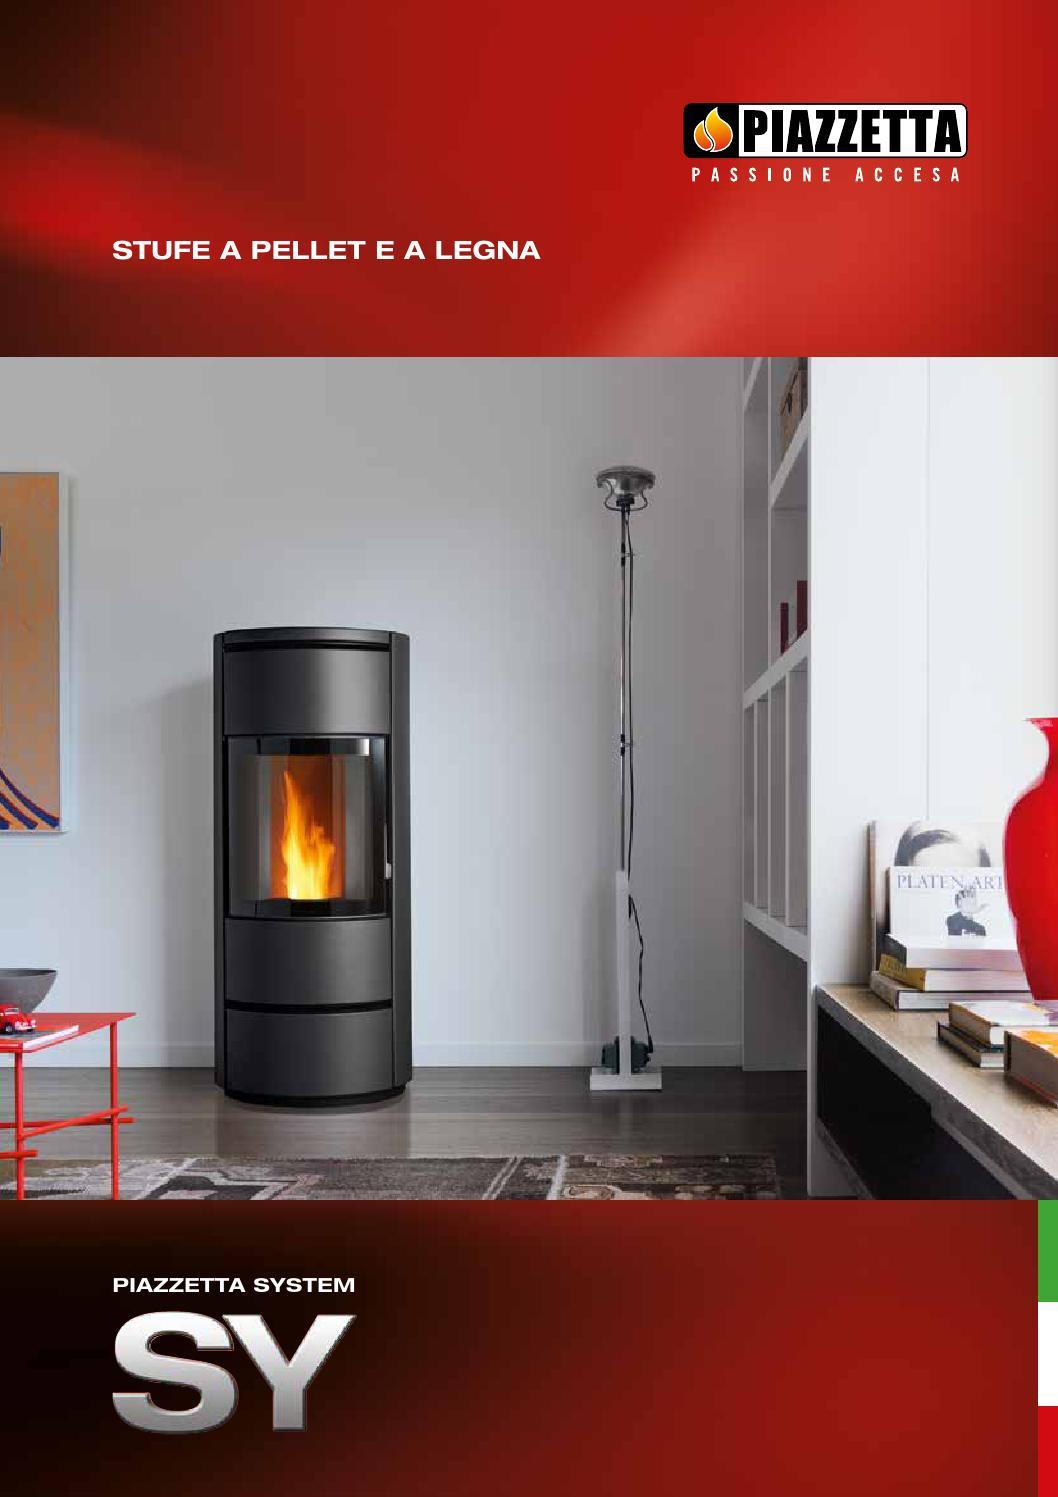 Piazzetta stufe 2015 by idea studio caminetti issuu - Stufe a legna piazzetta ...